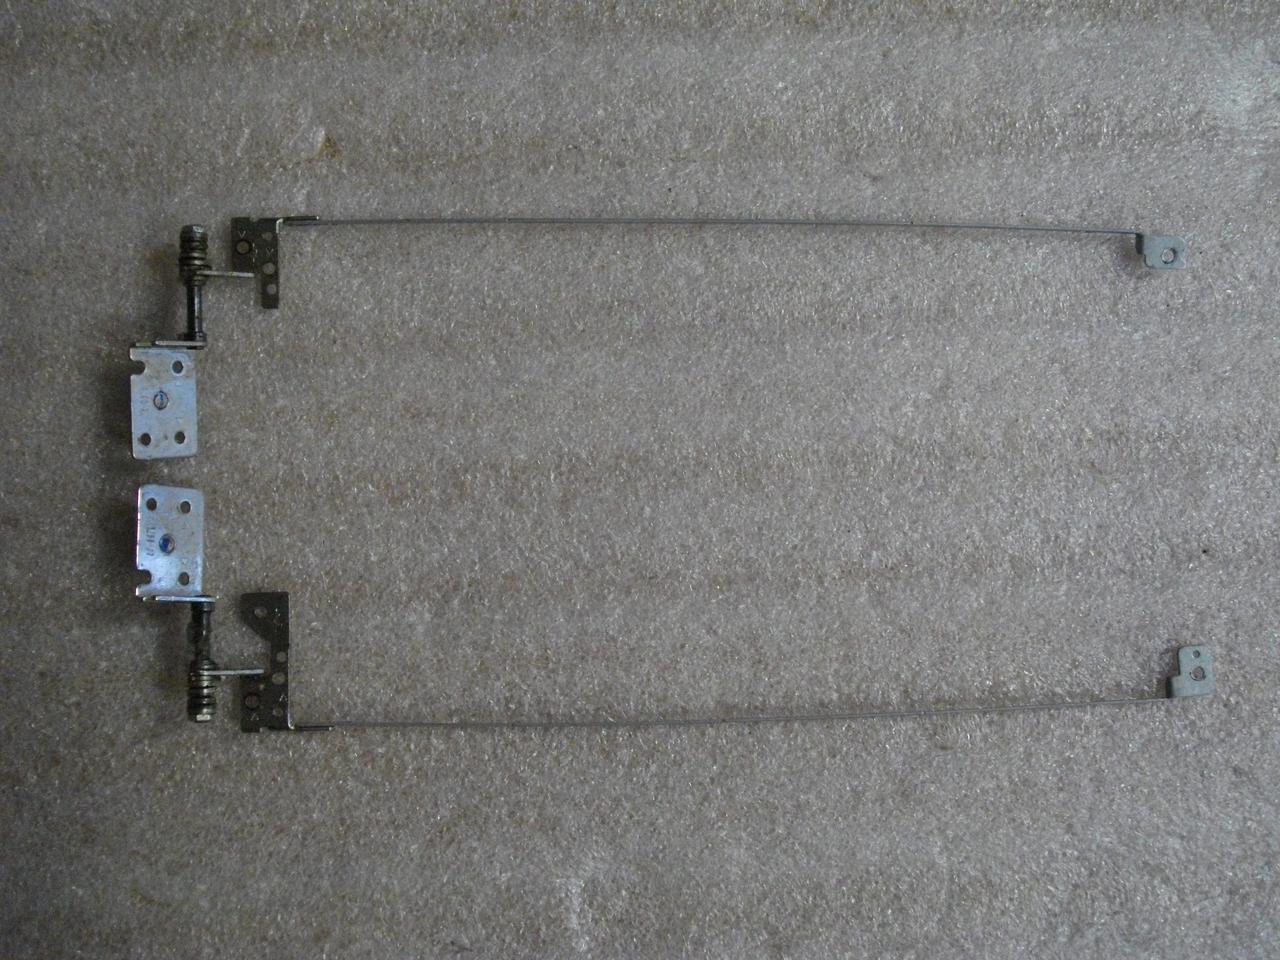 Петли 33.4IH16.XXX, 33.4IH17.XXX, Lenovo V570, B570, V575, B575, V570C  бу